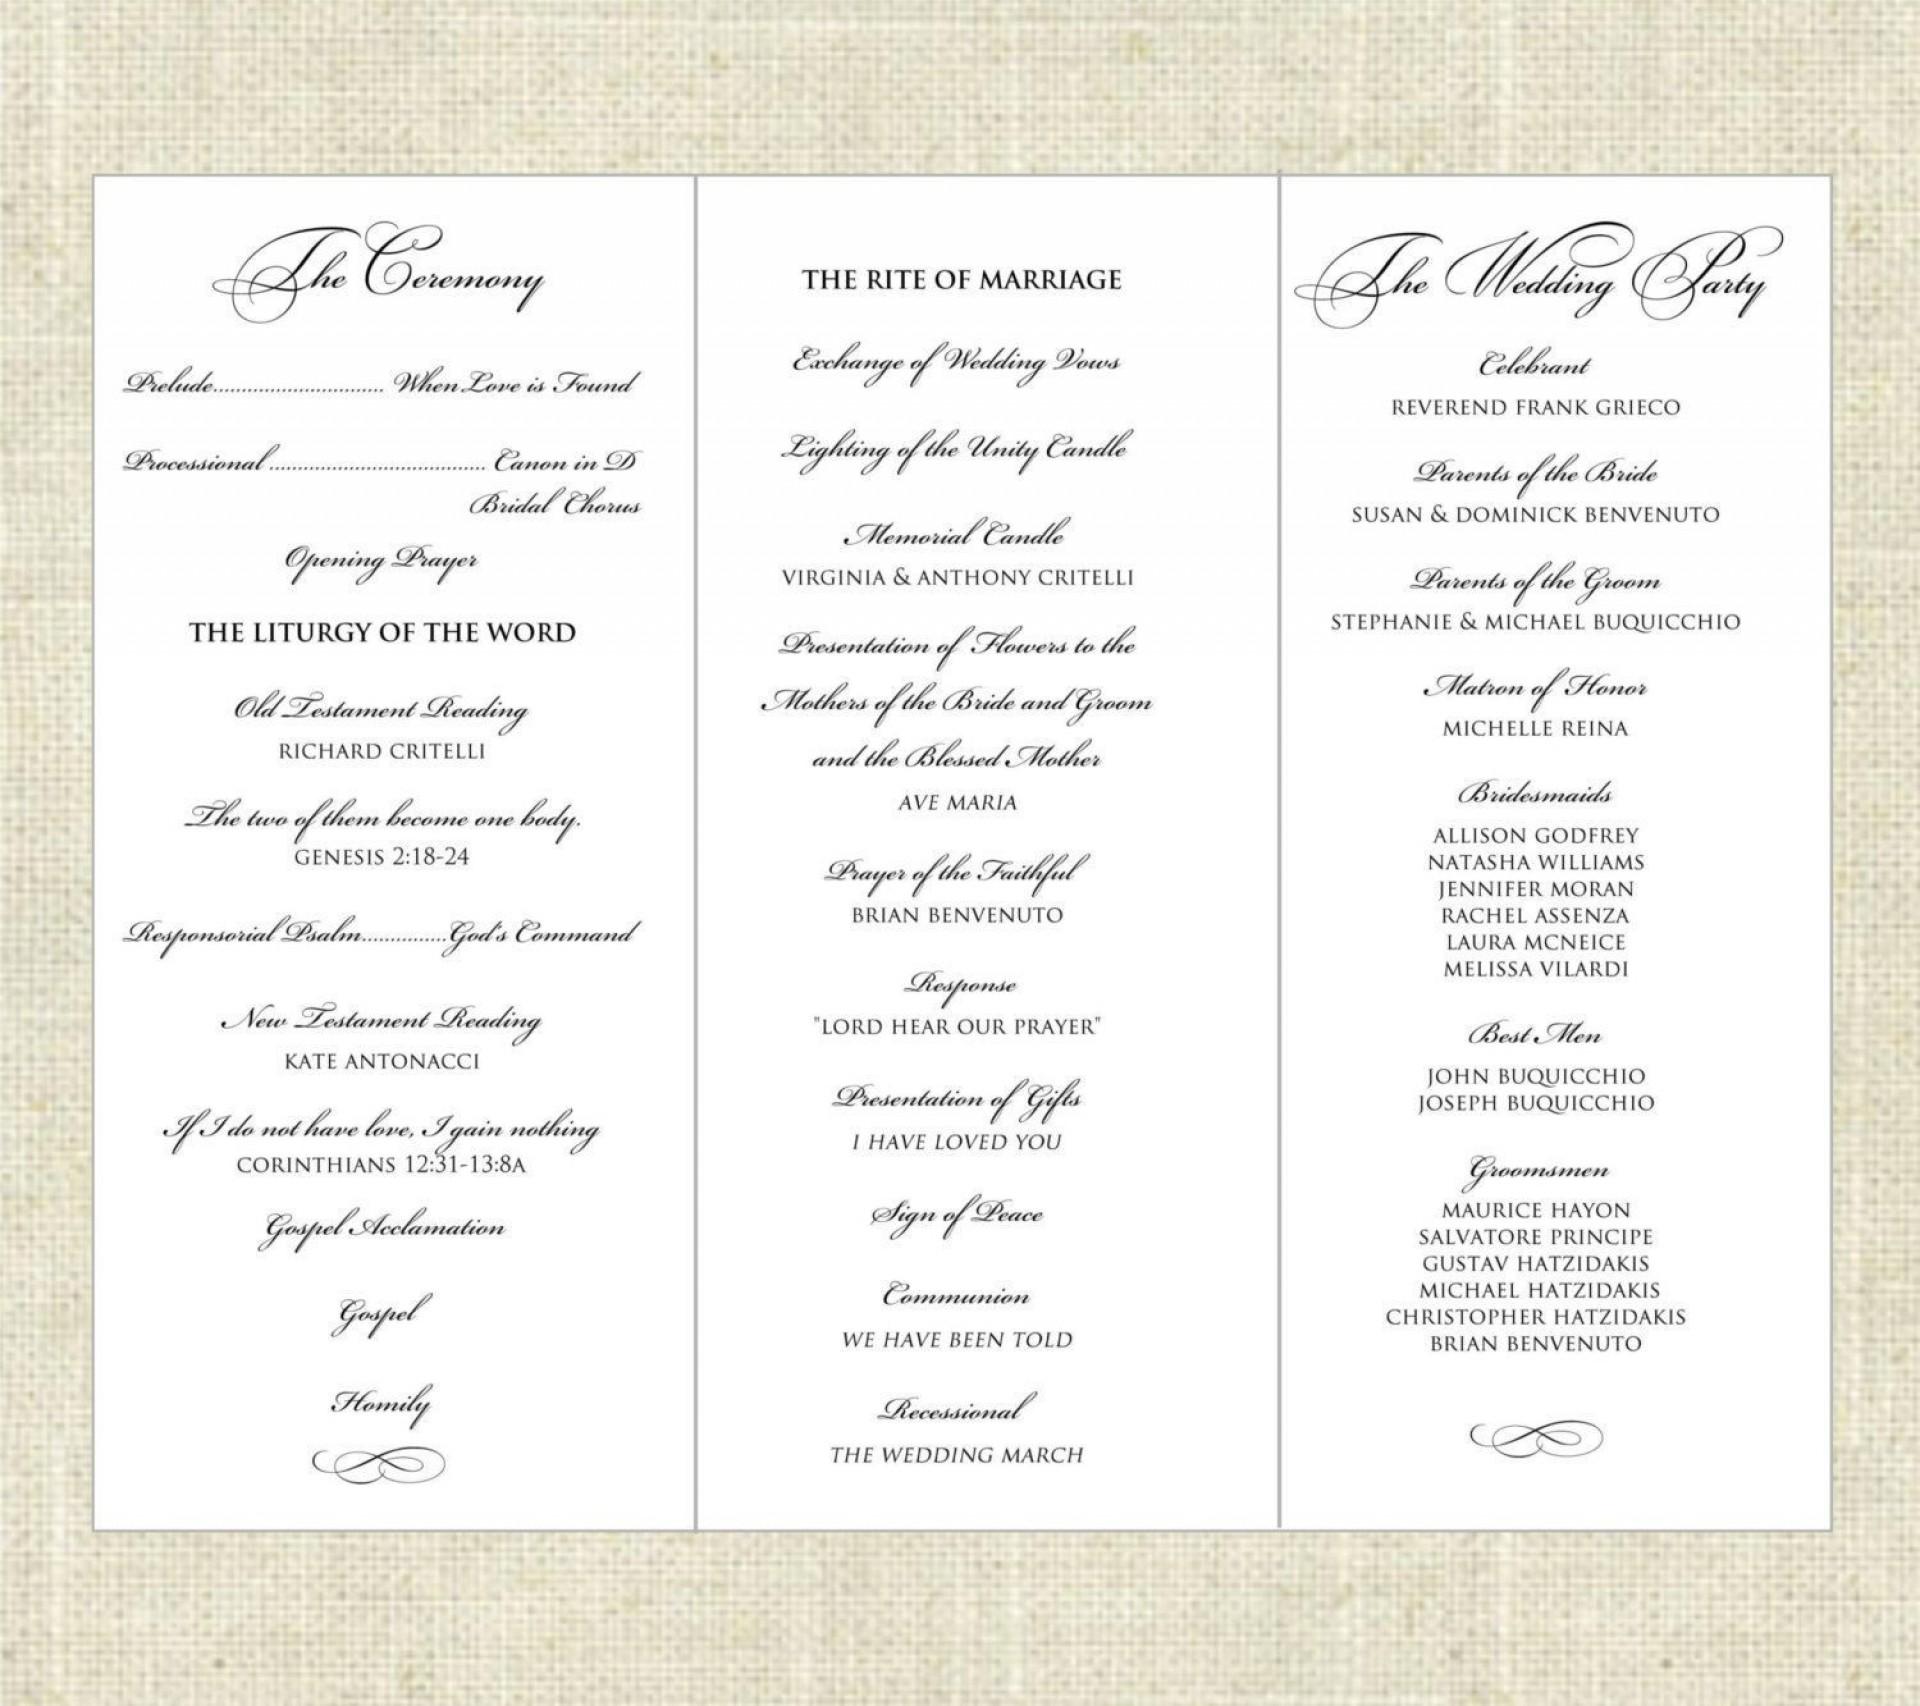 001 Fantastic Trifold Wedding Program Template High Resolution  Tri Fold Word Folded Example1920